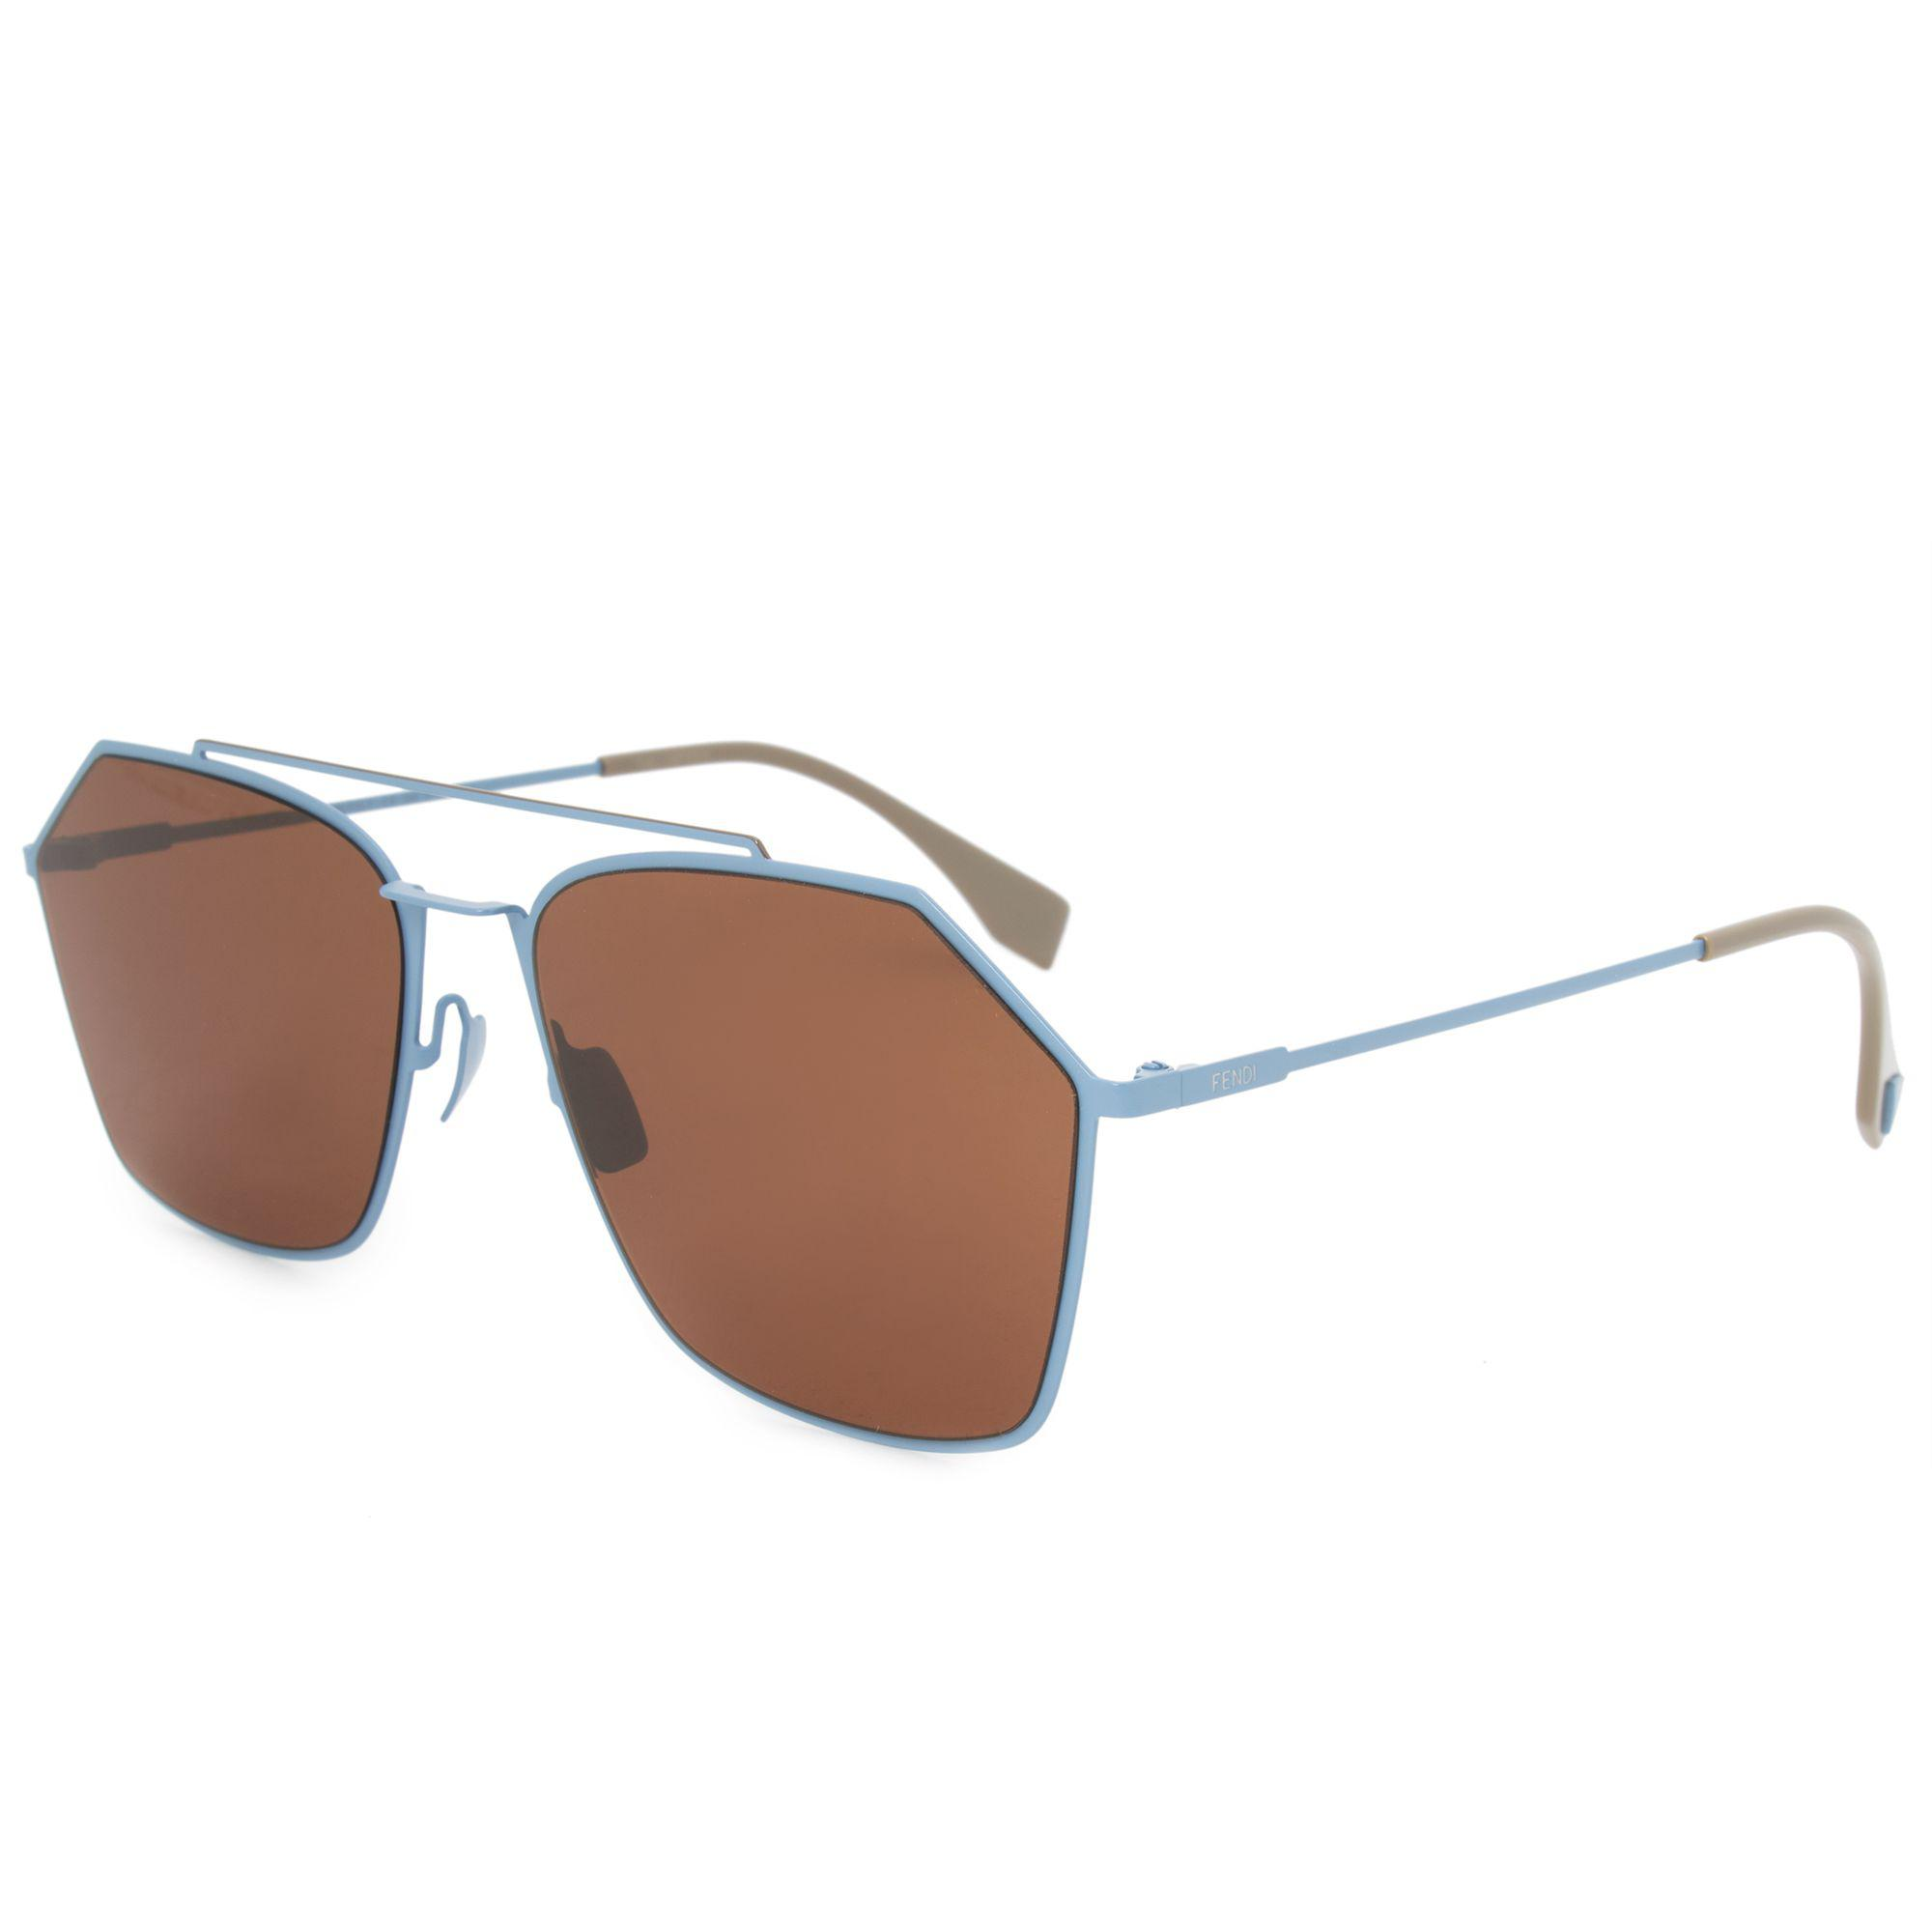 01ce2dea0e5 Fendi - Multicolor Eyeline Aviator Sunglasses Ffm0022s F Mvu 70 59 - Lyst.  View fullscreen